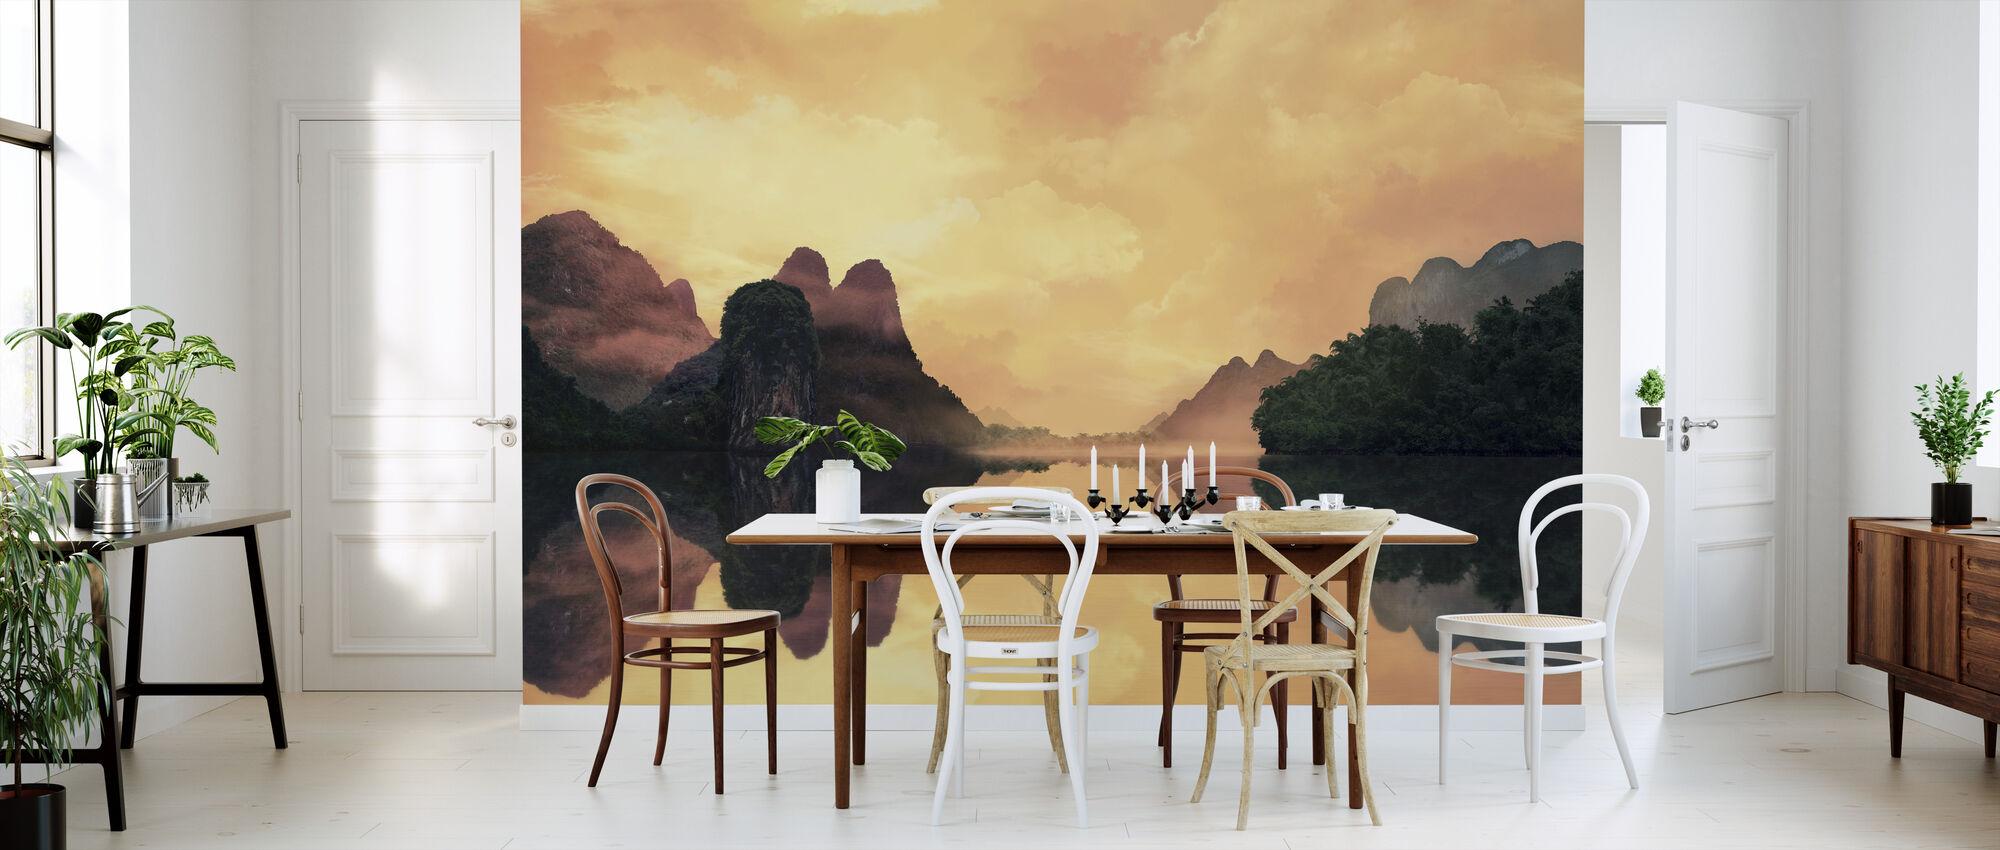 Hazy Sunset Reflection - Wallpaper - Kitchen